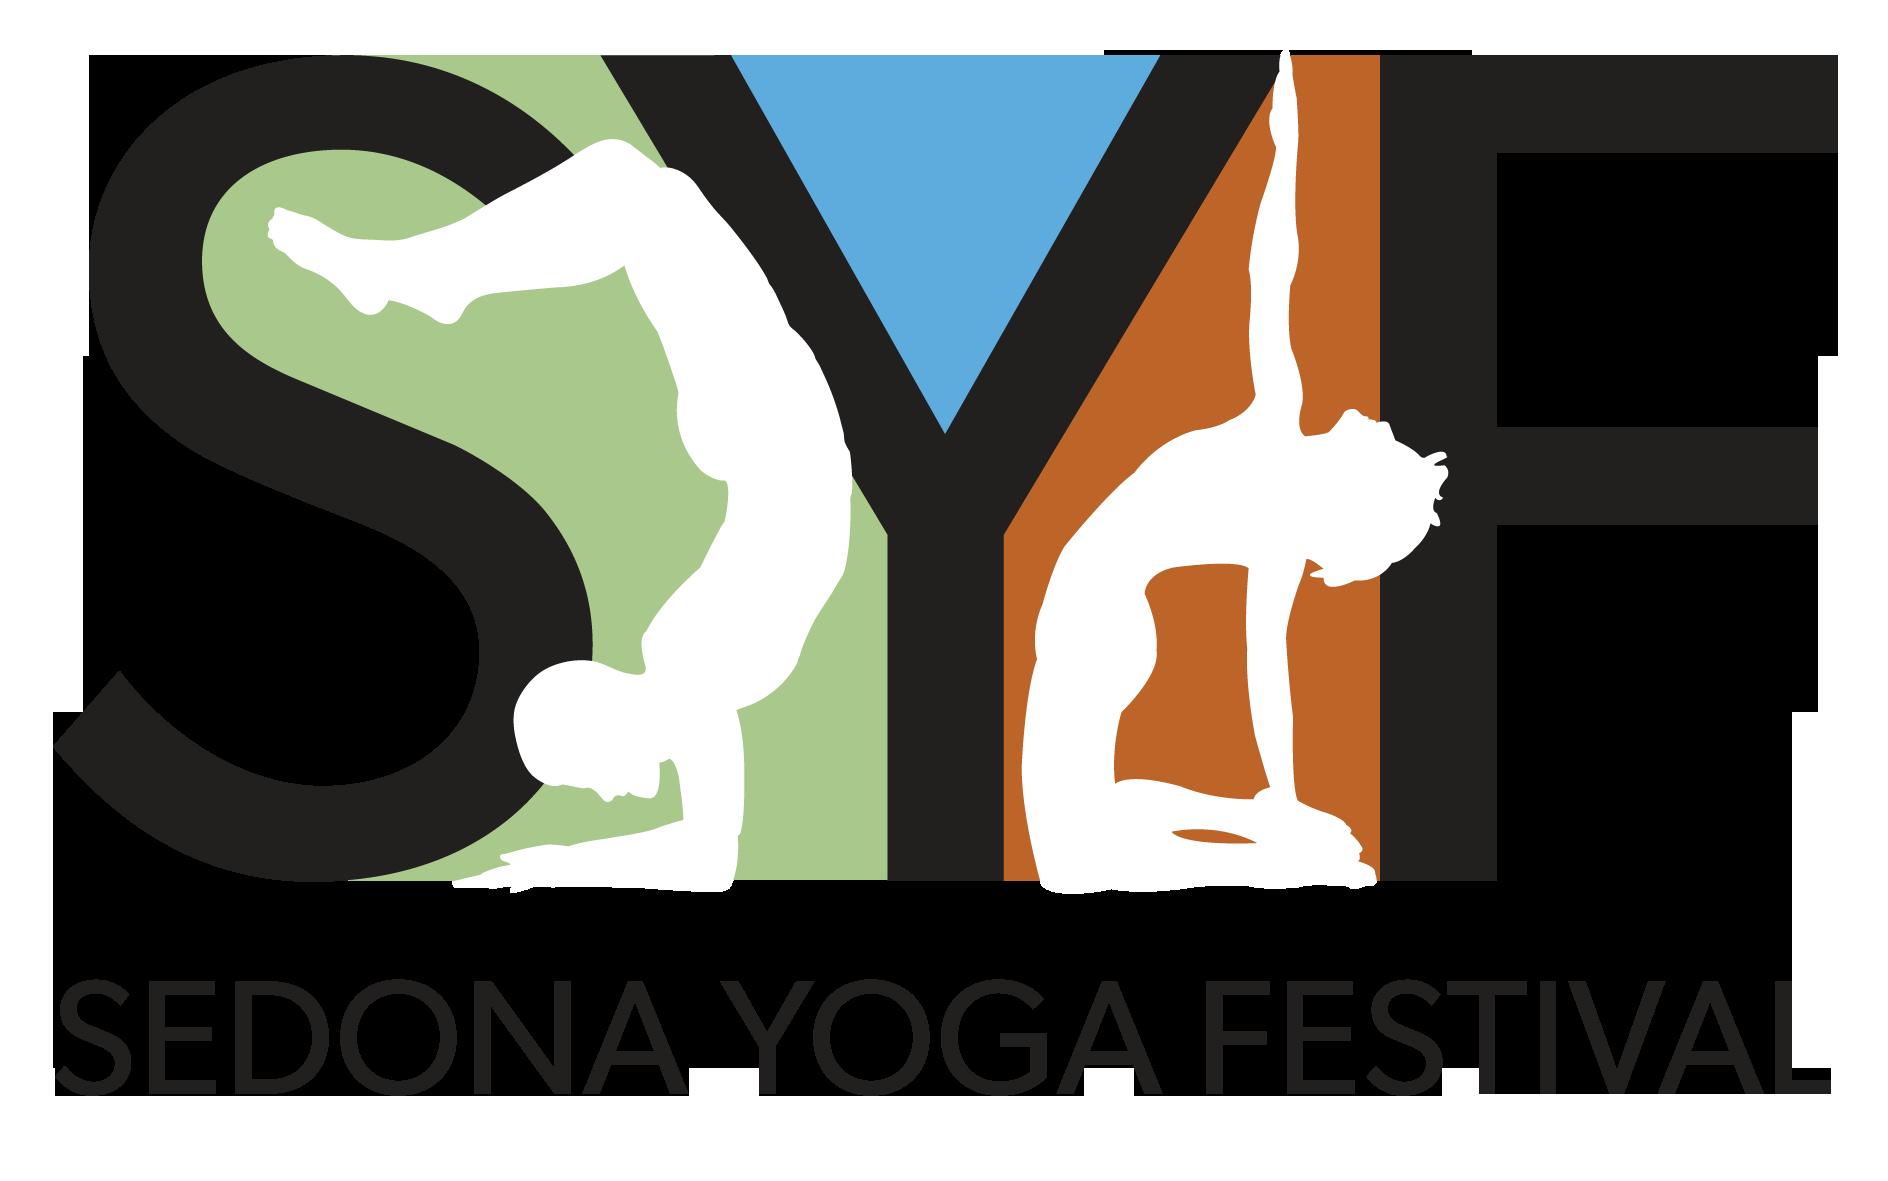 SYF-logo-png 1888 wide